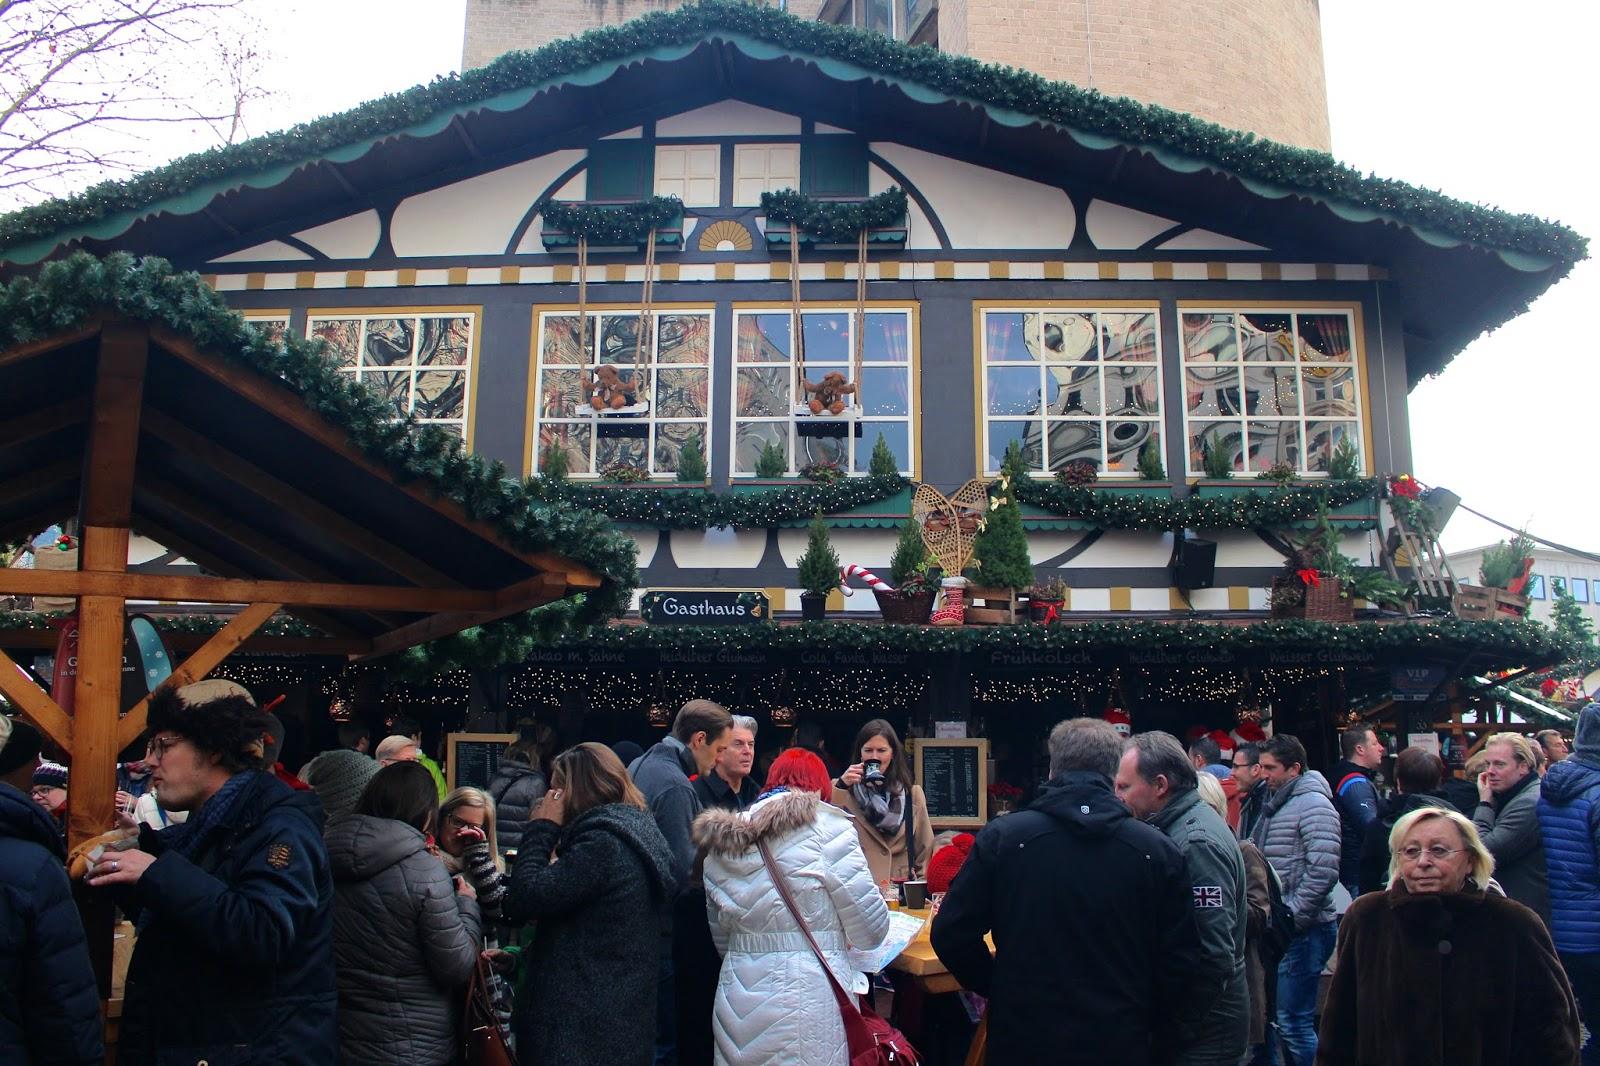 Village of St Nicholas Christmas Market